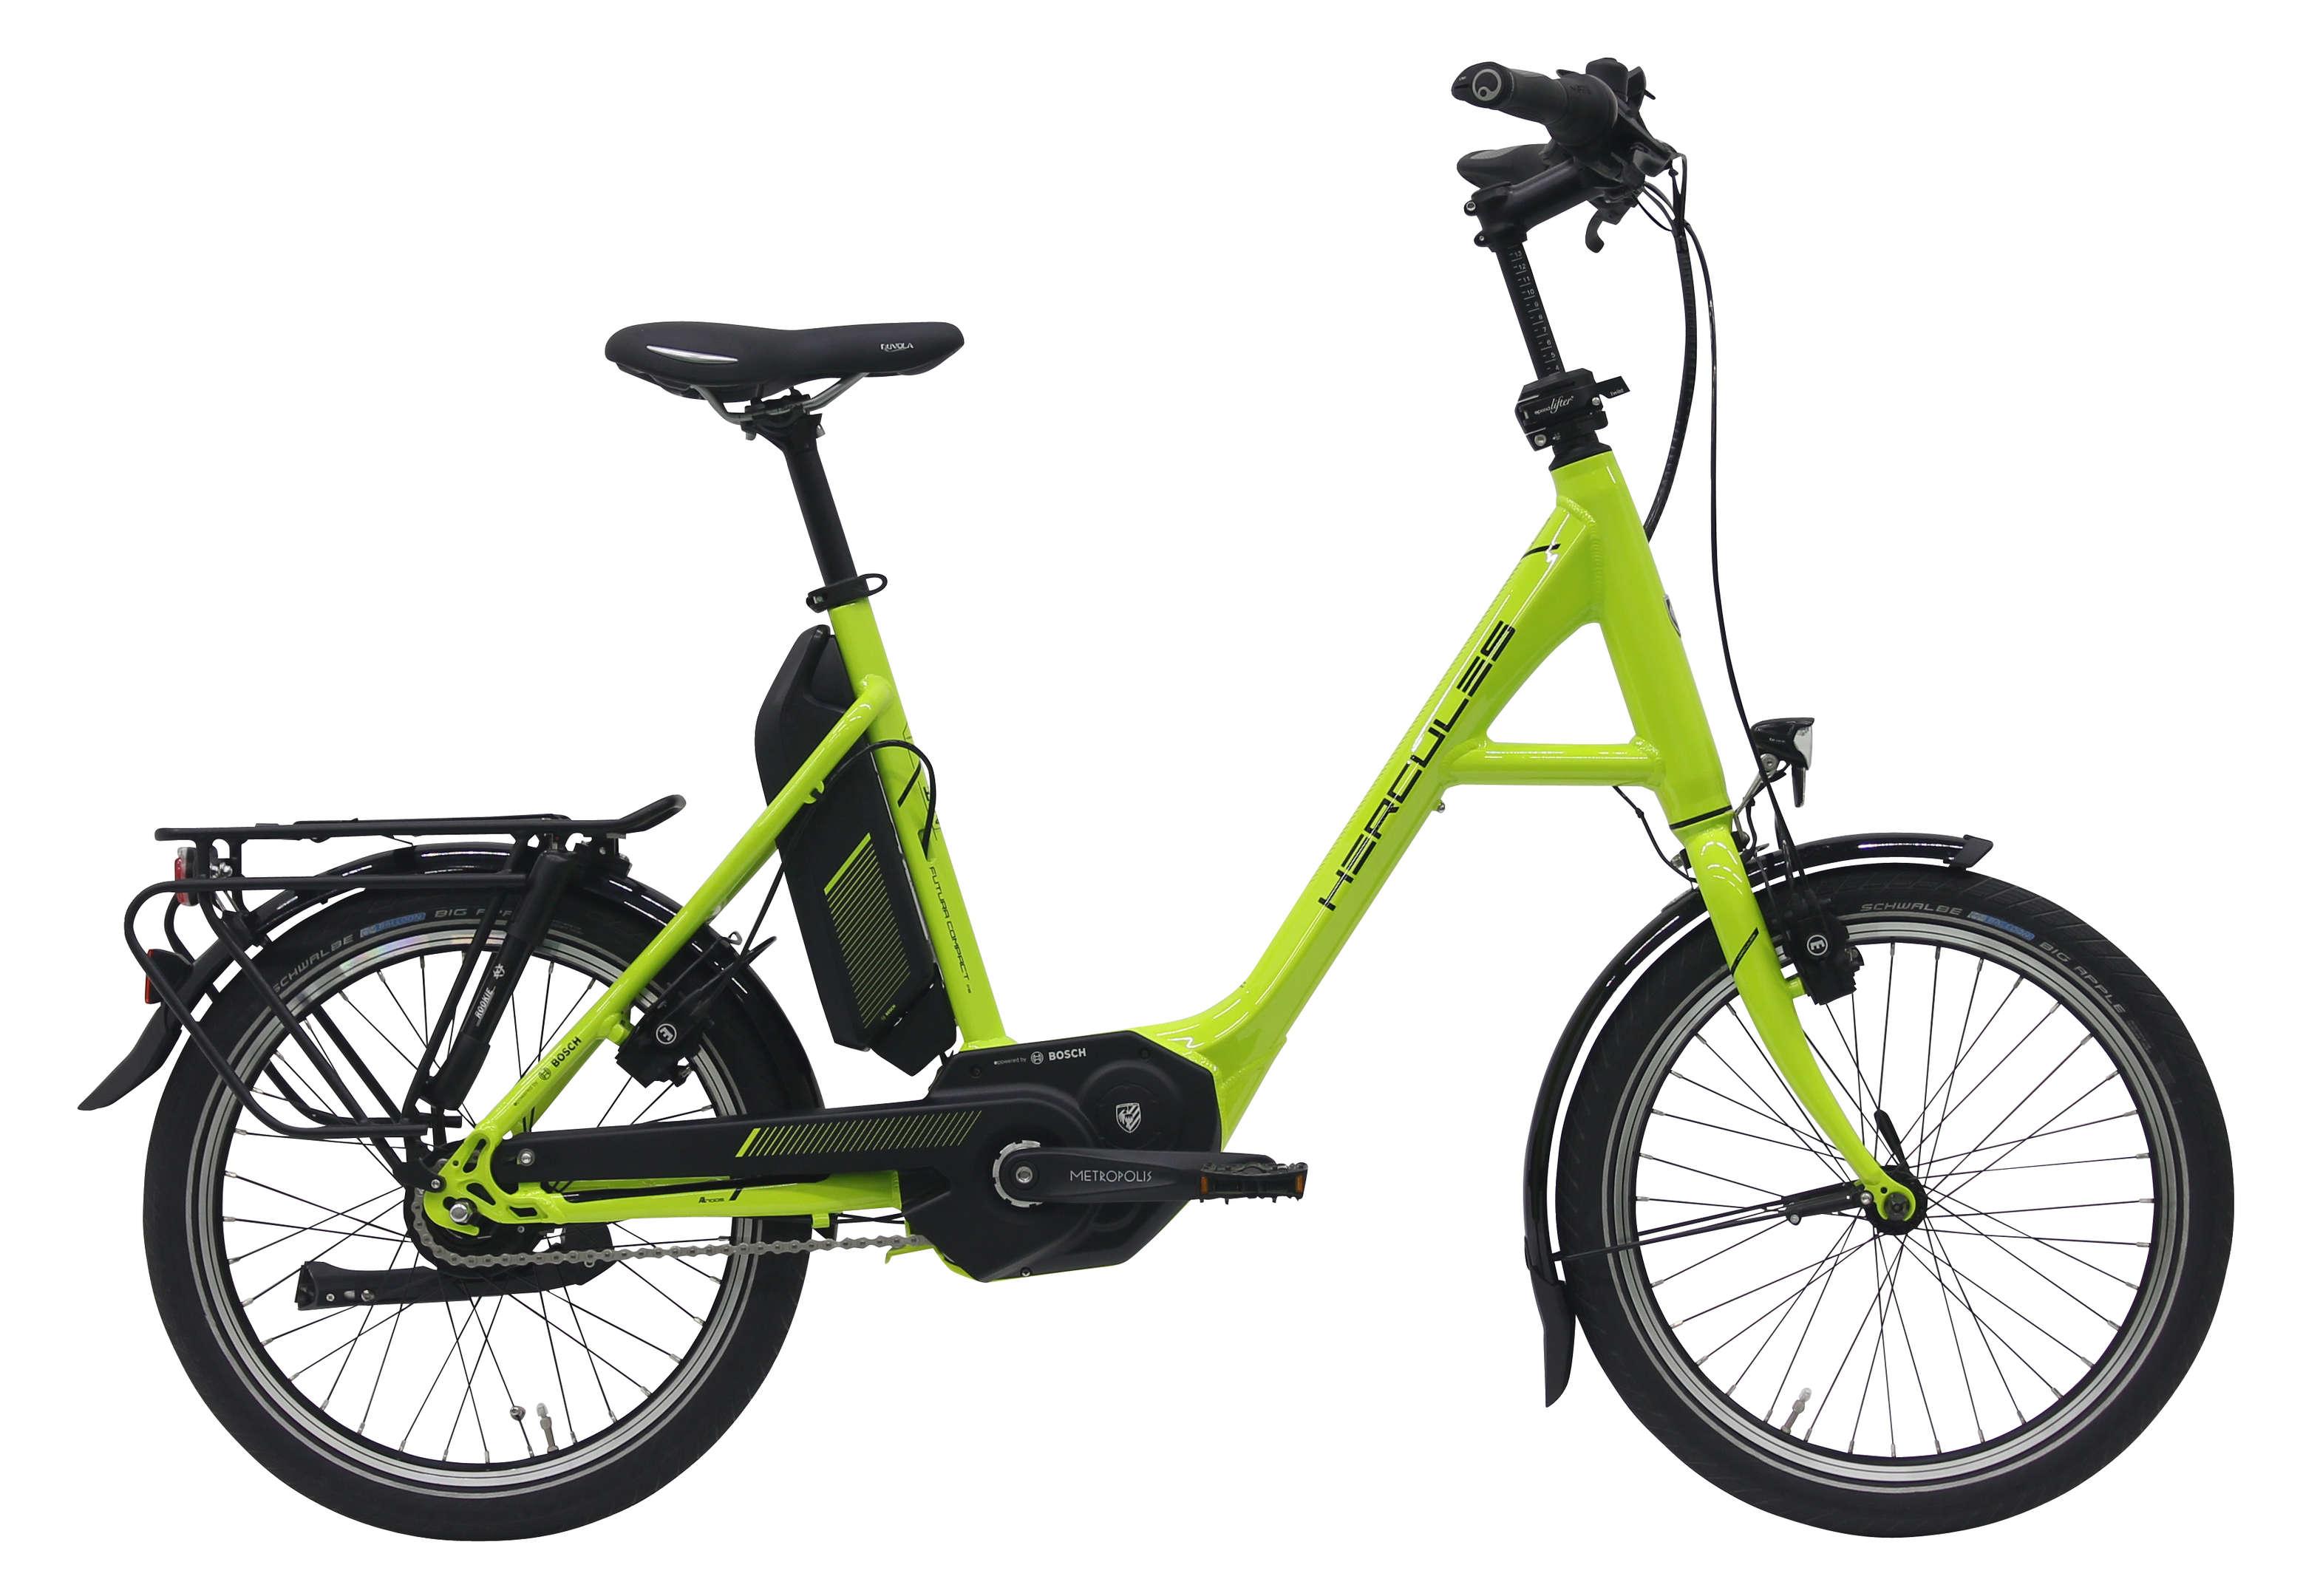 hercules e bike futura compact f8 eurorad bikeleasingeurorad bikeleasing. Black Bedroom Furniture Sets. Home Design Ideas